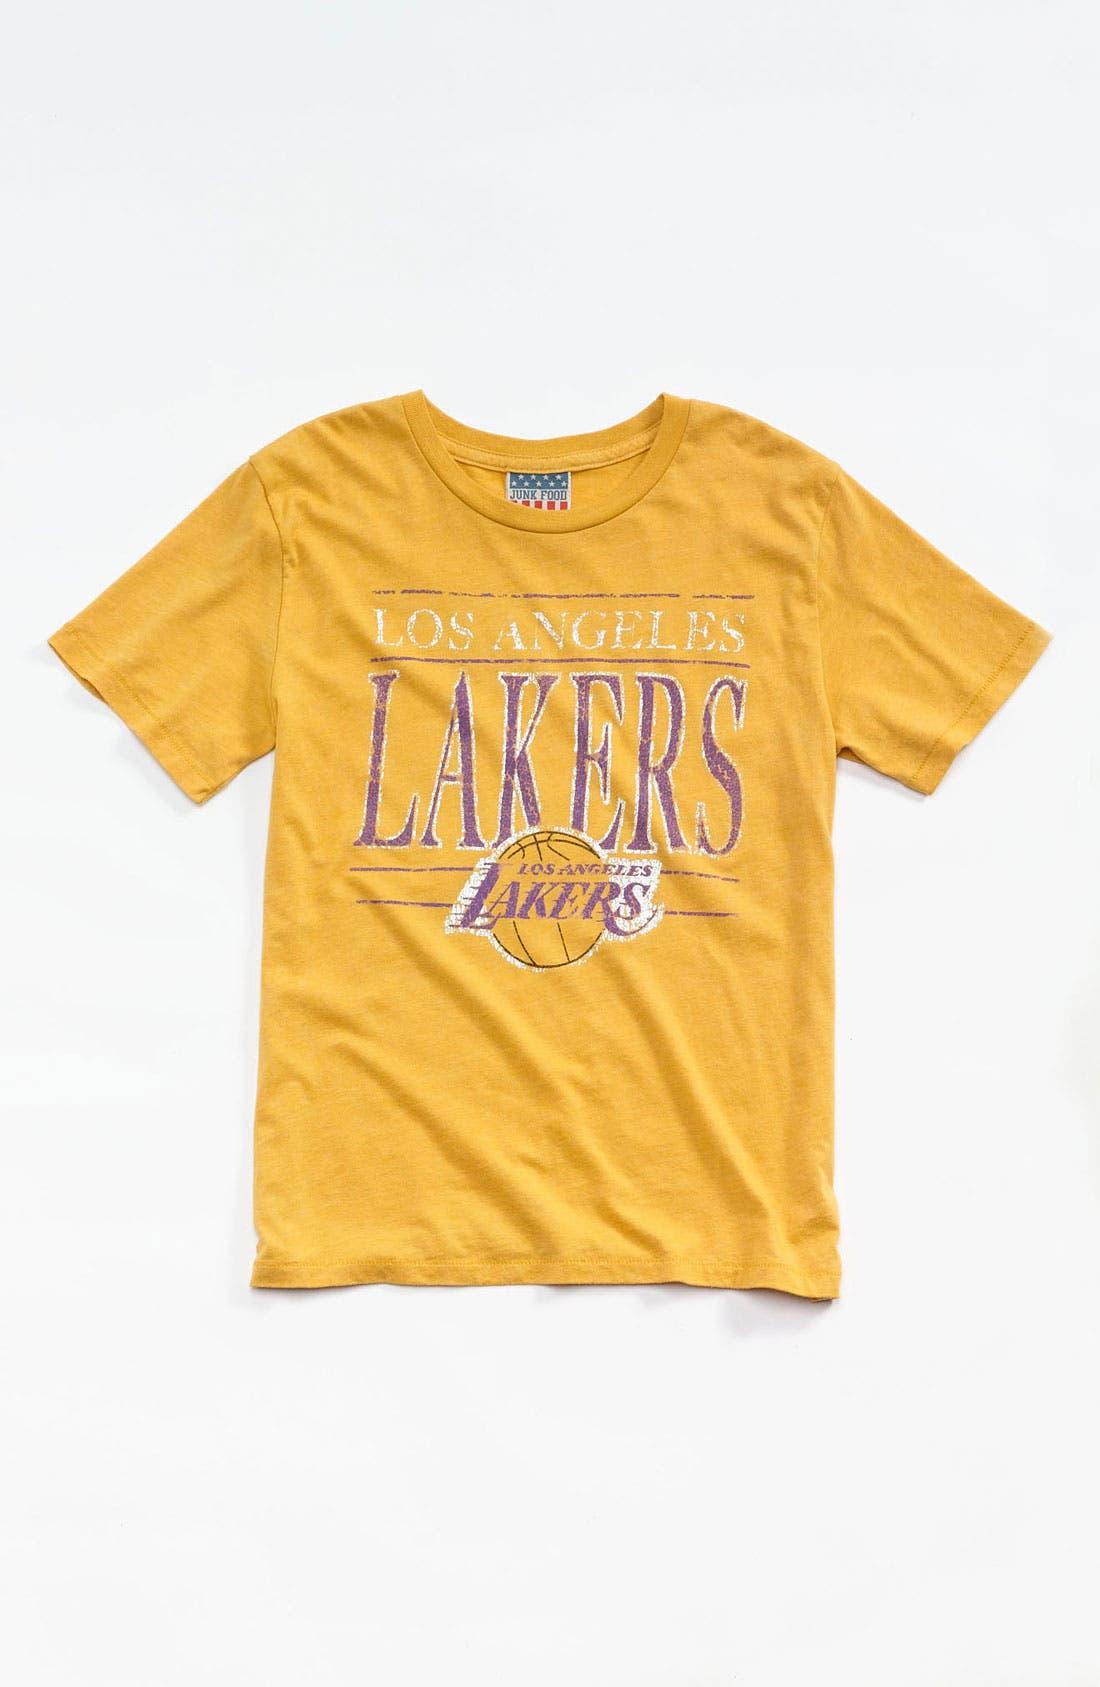 Alternate Image 1 Selected - Junk Food 'Los Angeles Lakers' T-Shirt (Little Boys & Big Boys)